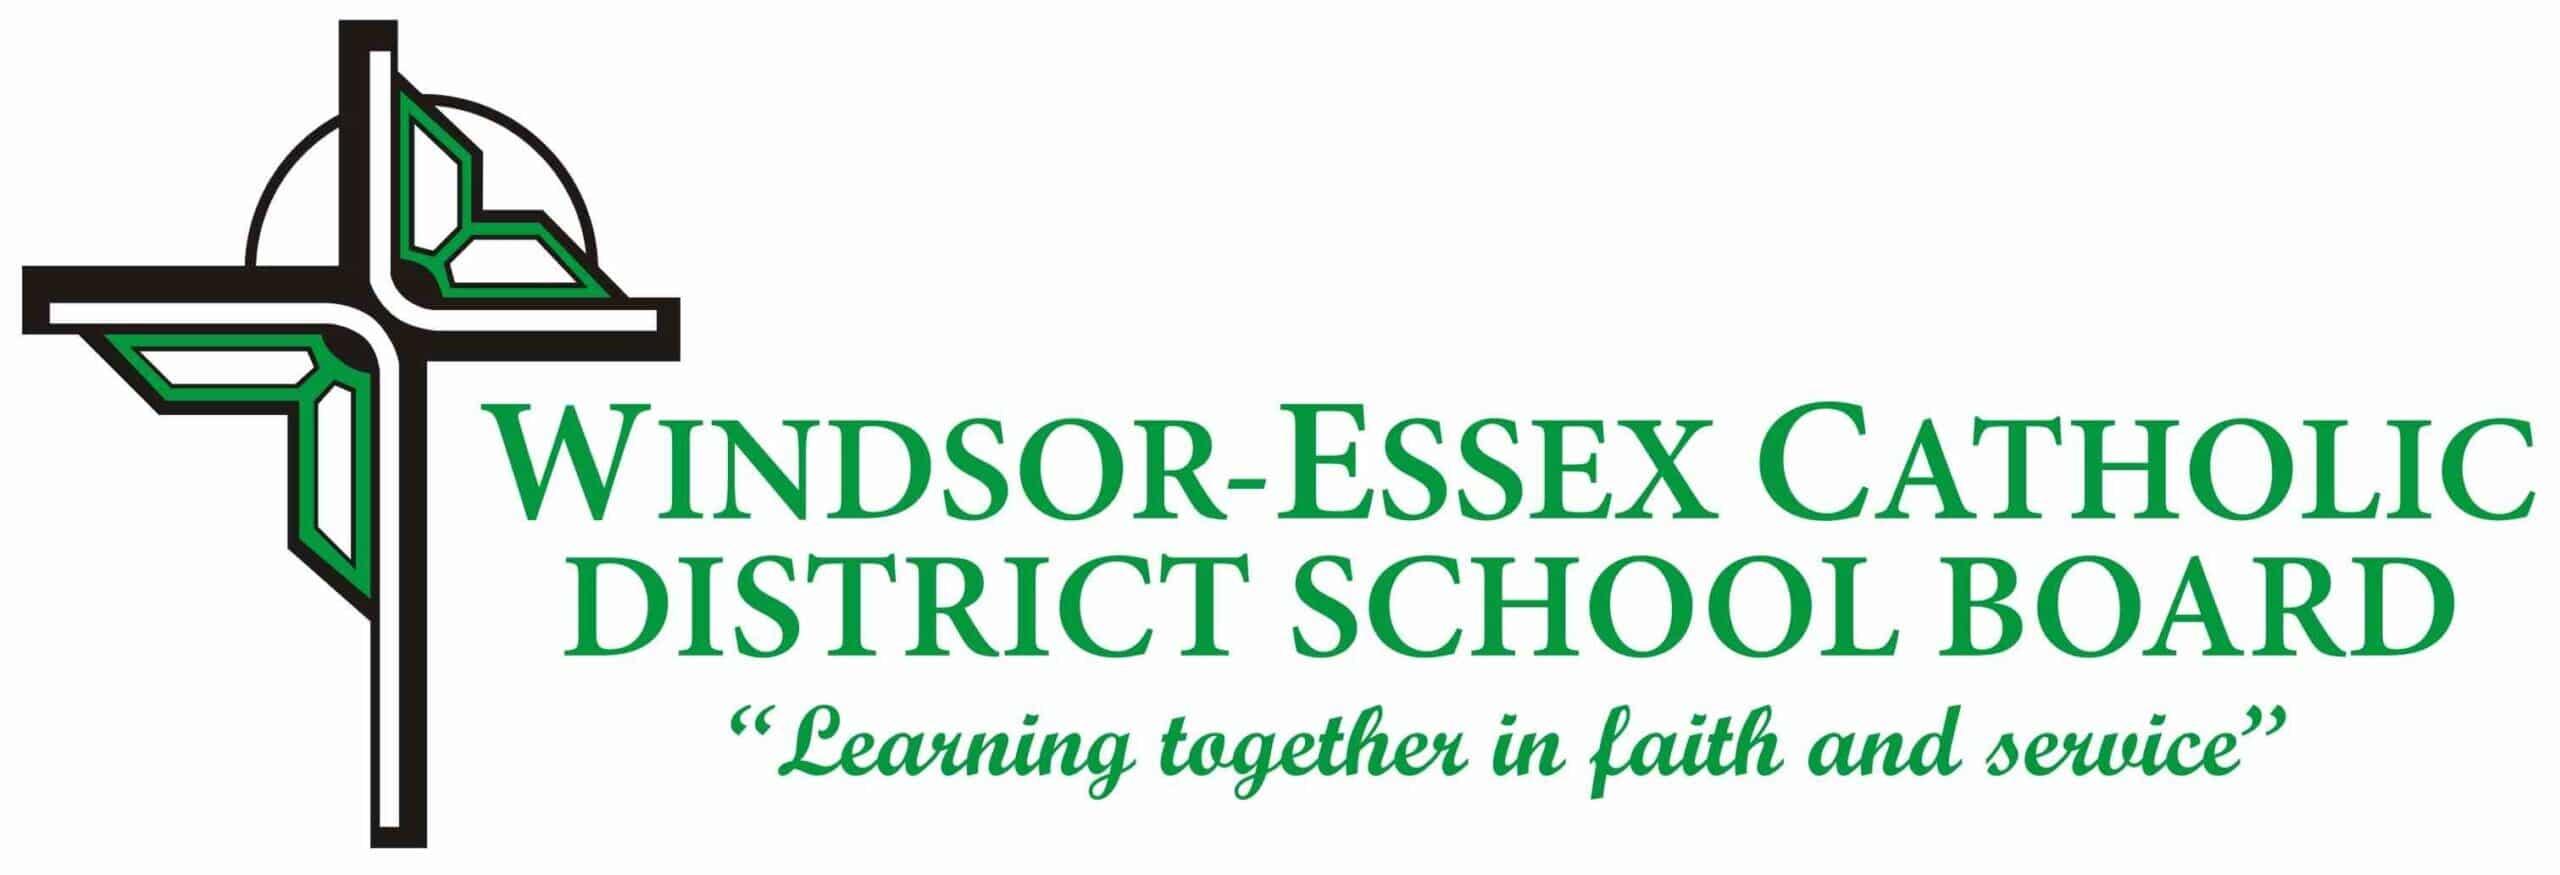 Windsor Essex Catholic District School Board